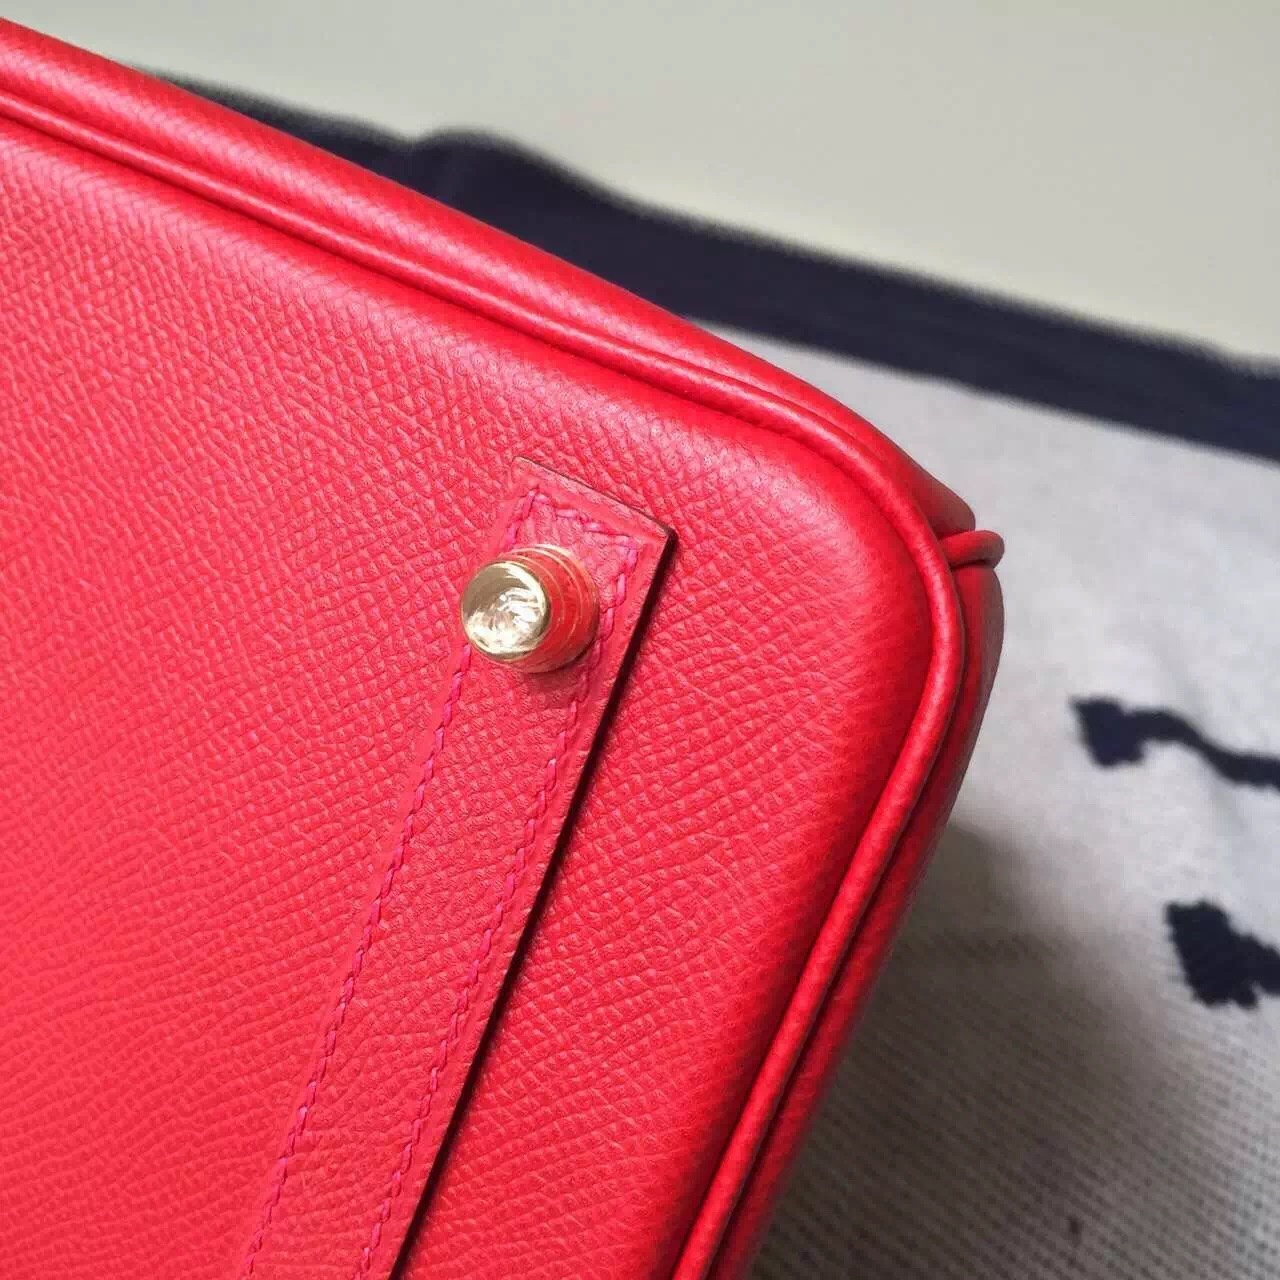 New Pretty Hermes Q5 Rouge Casaque Epsom Leather Birkin25cm Bag